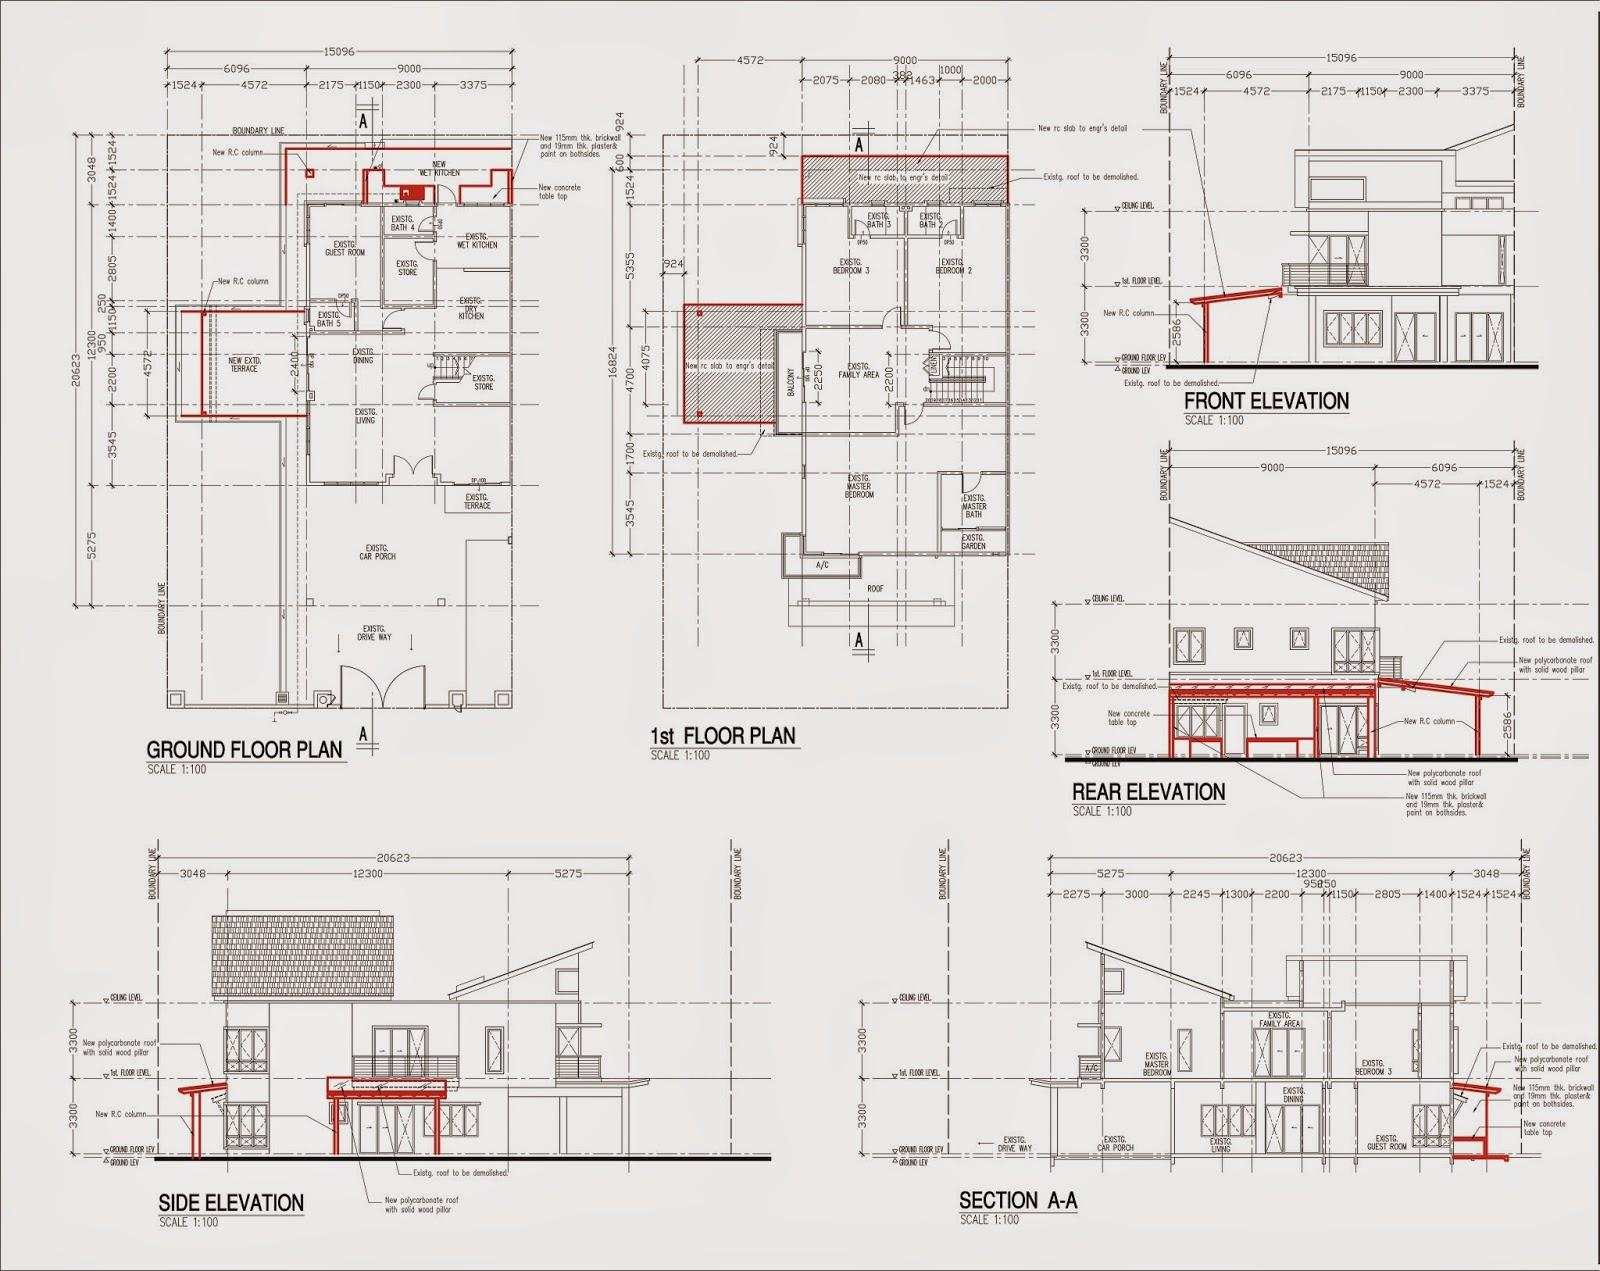 Lukis pelan kelulusan dan rekabentuk rekabentuk pelan for Plans d arkitek